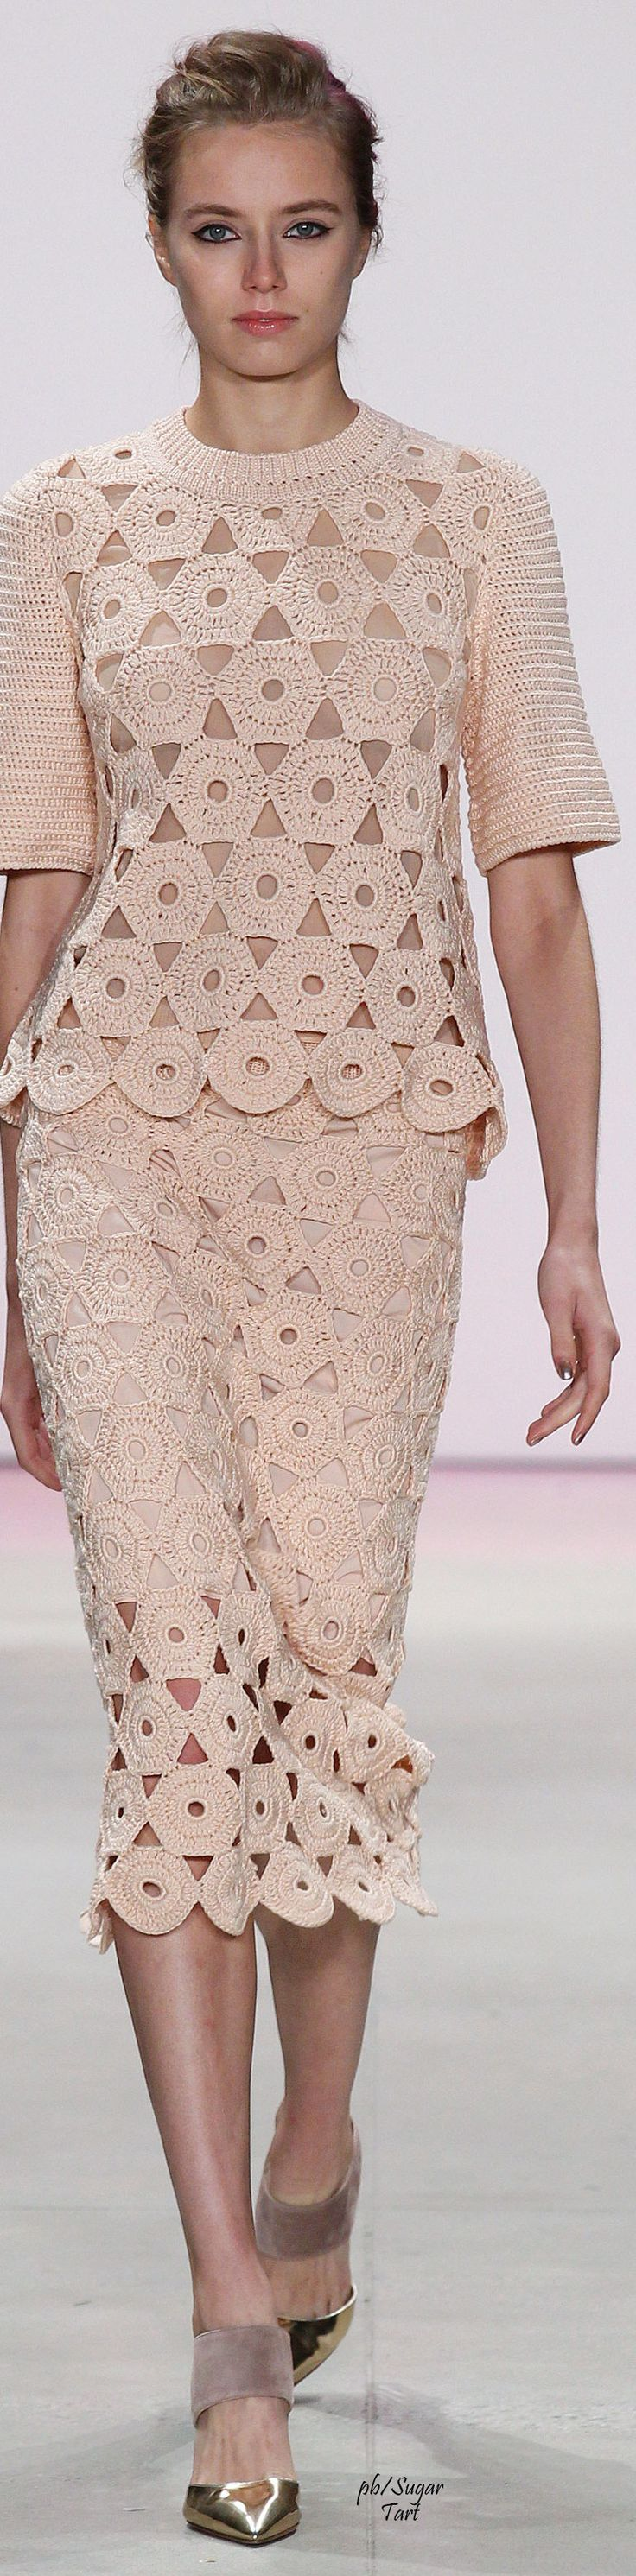 Lela Rose Spring 2016 RTW  women fashion outfit clothing stylish apparel @roressclothes closet ideas